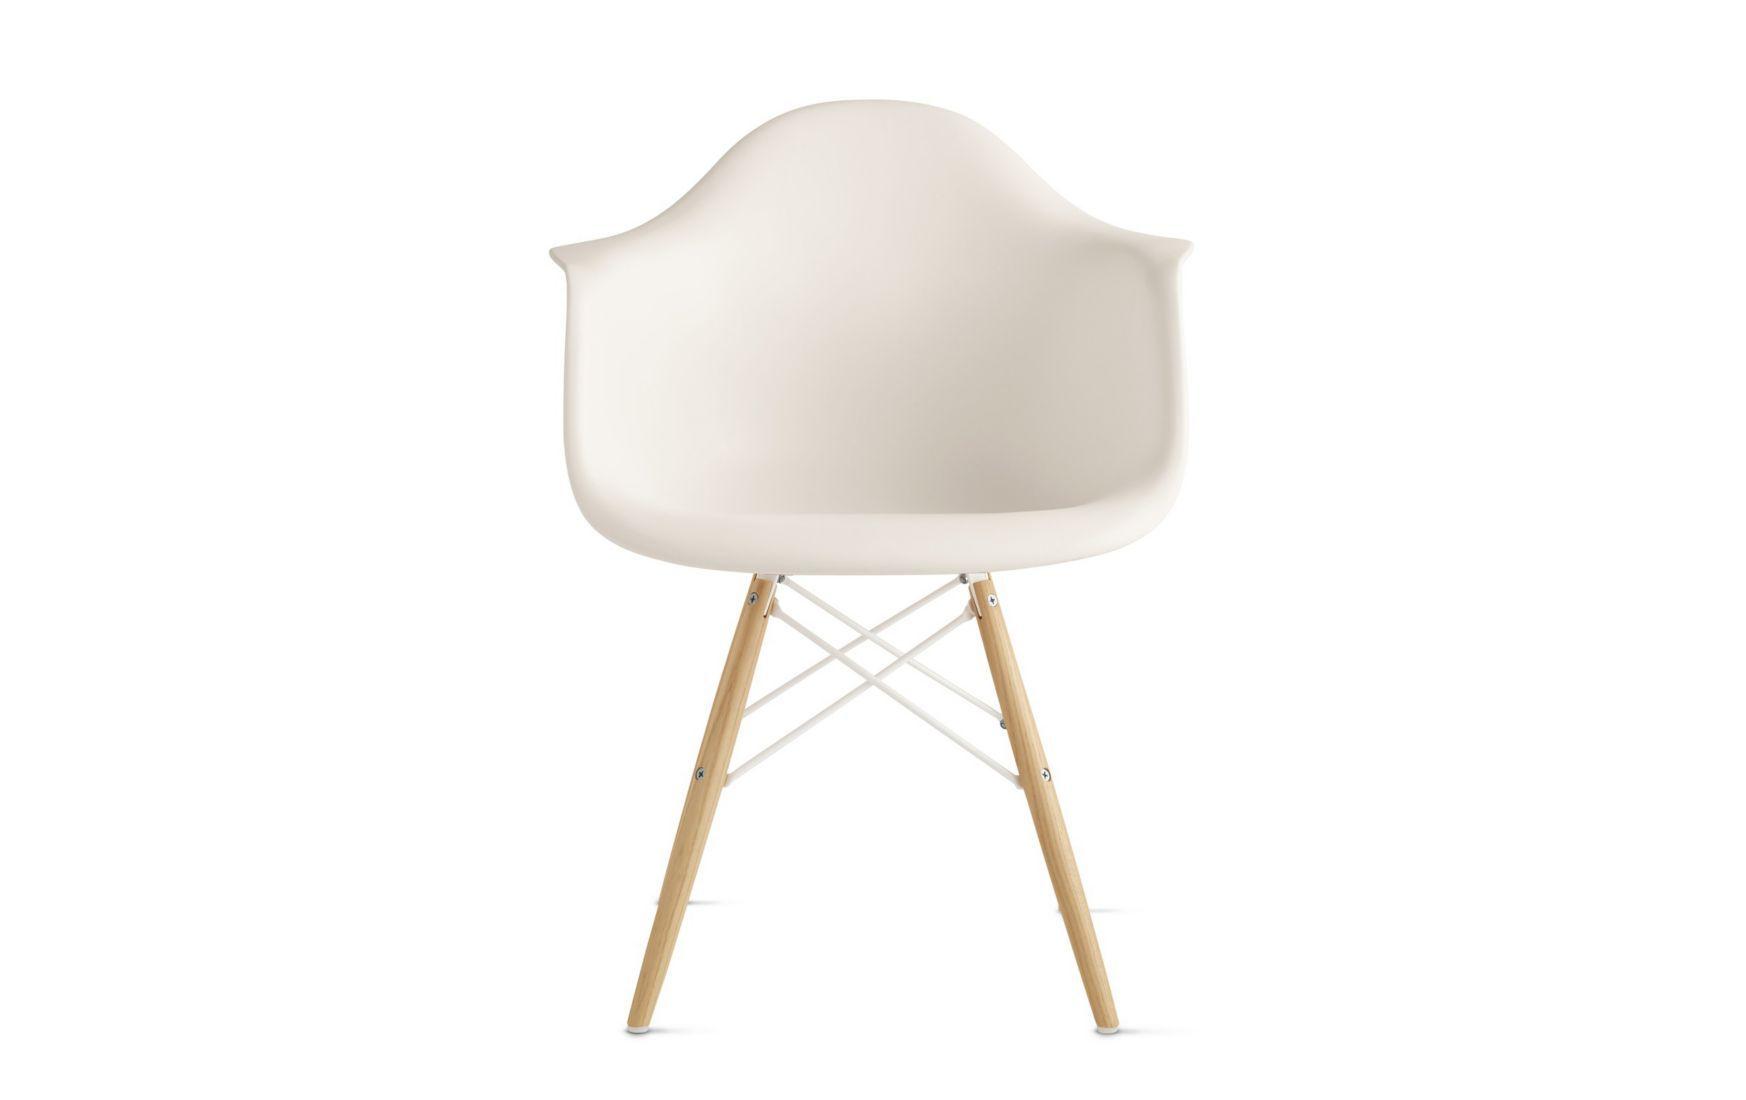 Eames Molded Plastic Dowel-Leg Armchair in white.